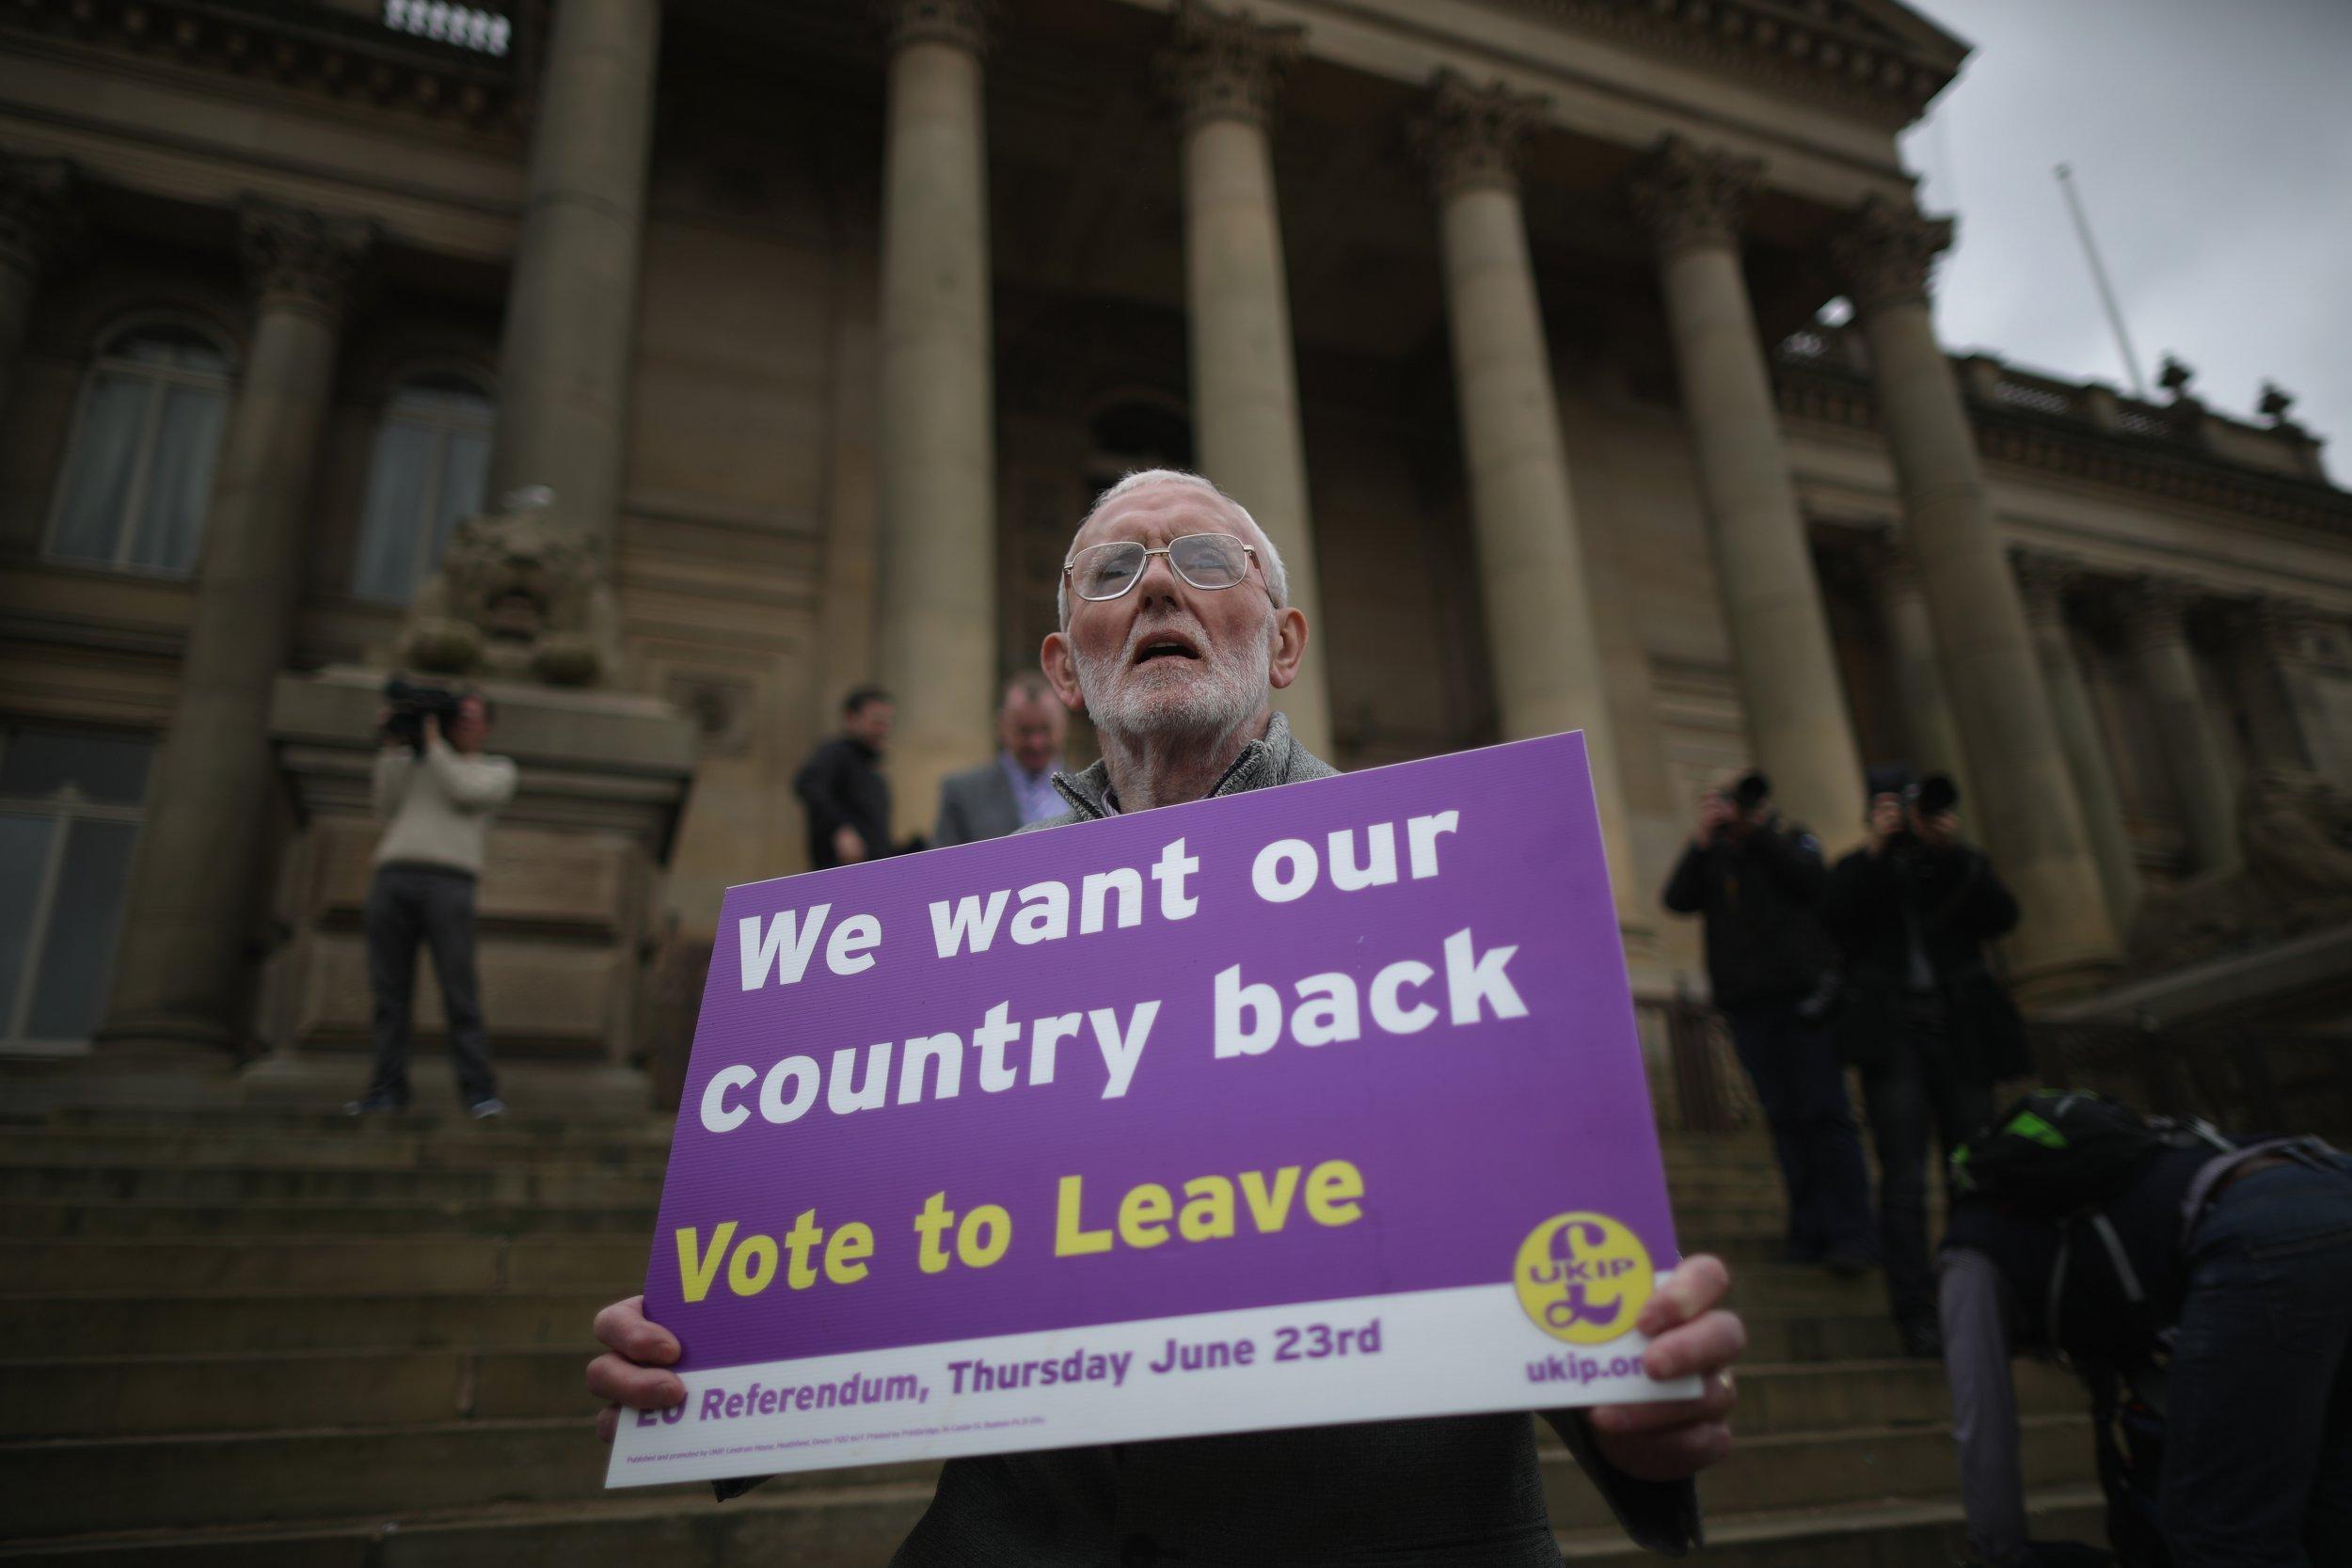 Leave EU campaigner